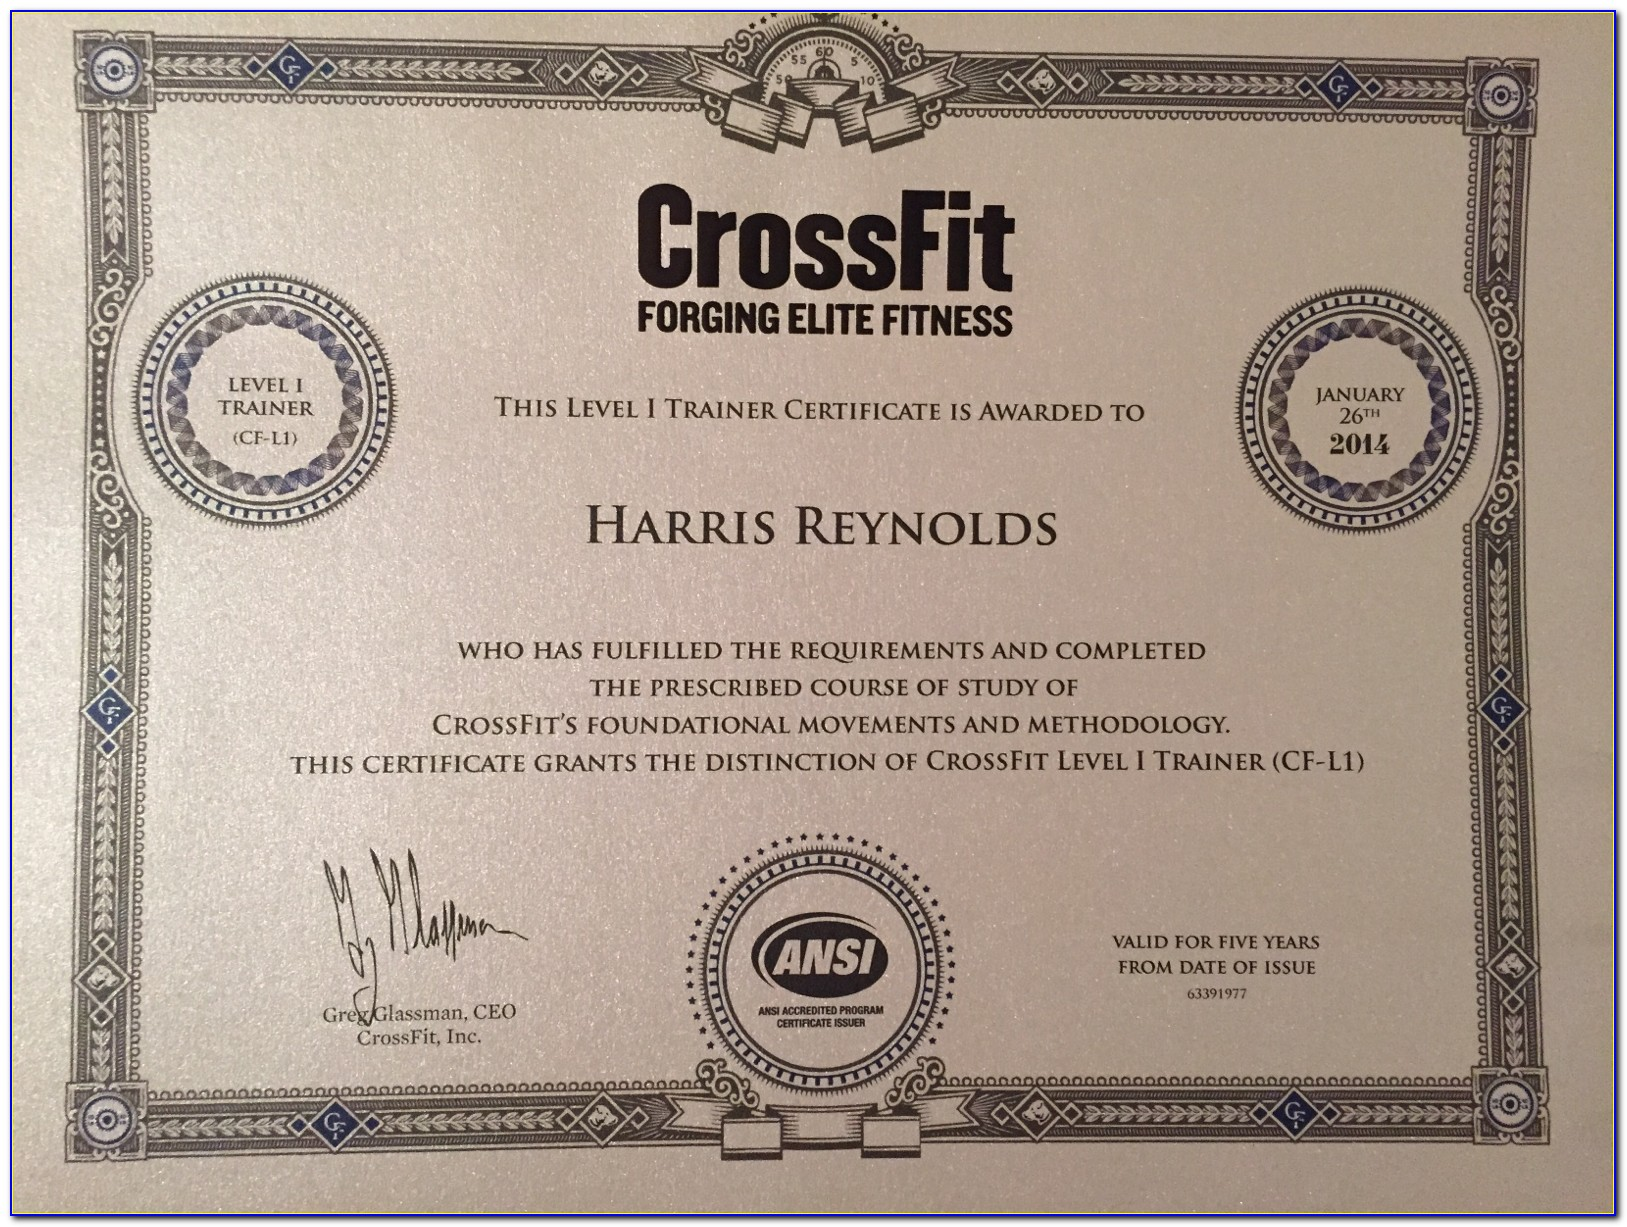 Crossfit Trainer Certification Online